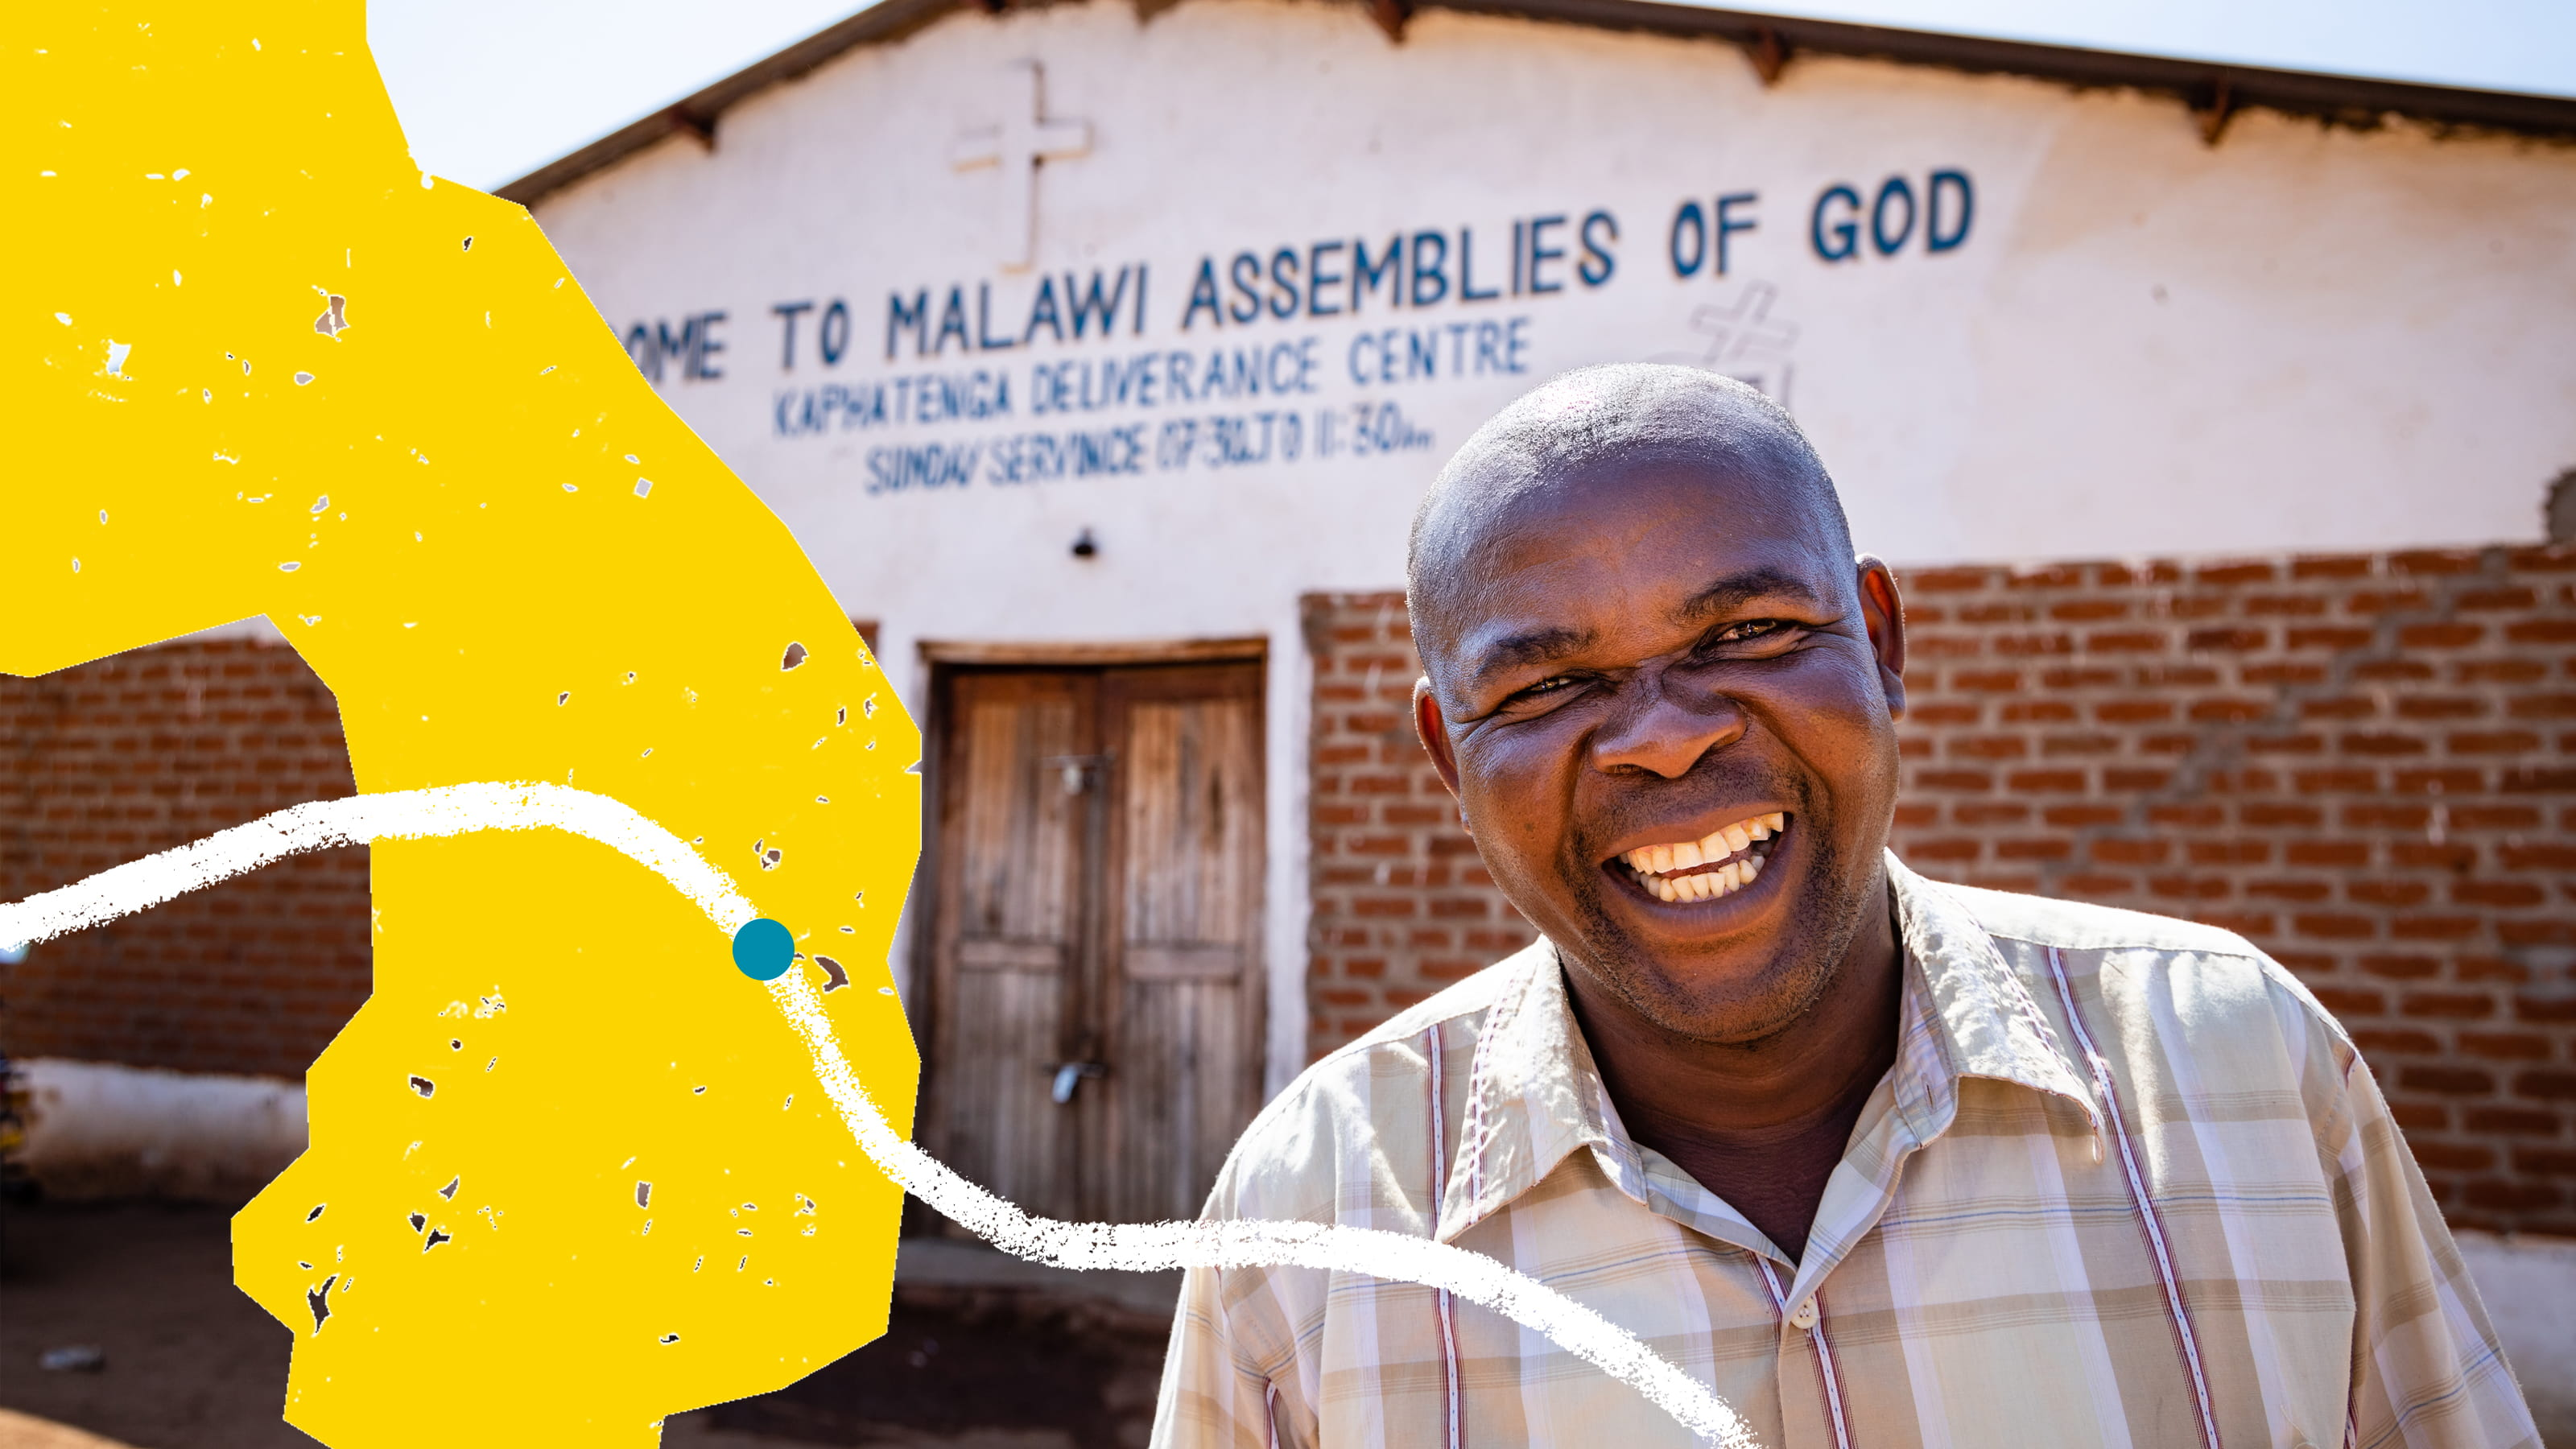 Smiling man standing outside Malawi Assemblies of God Church